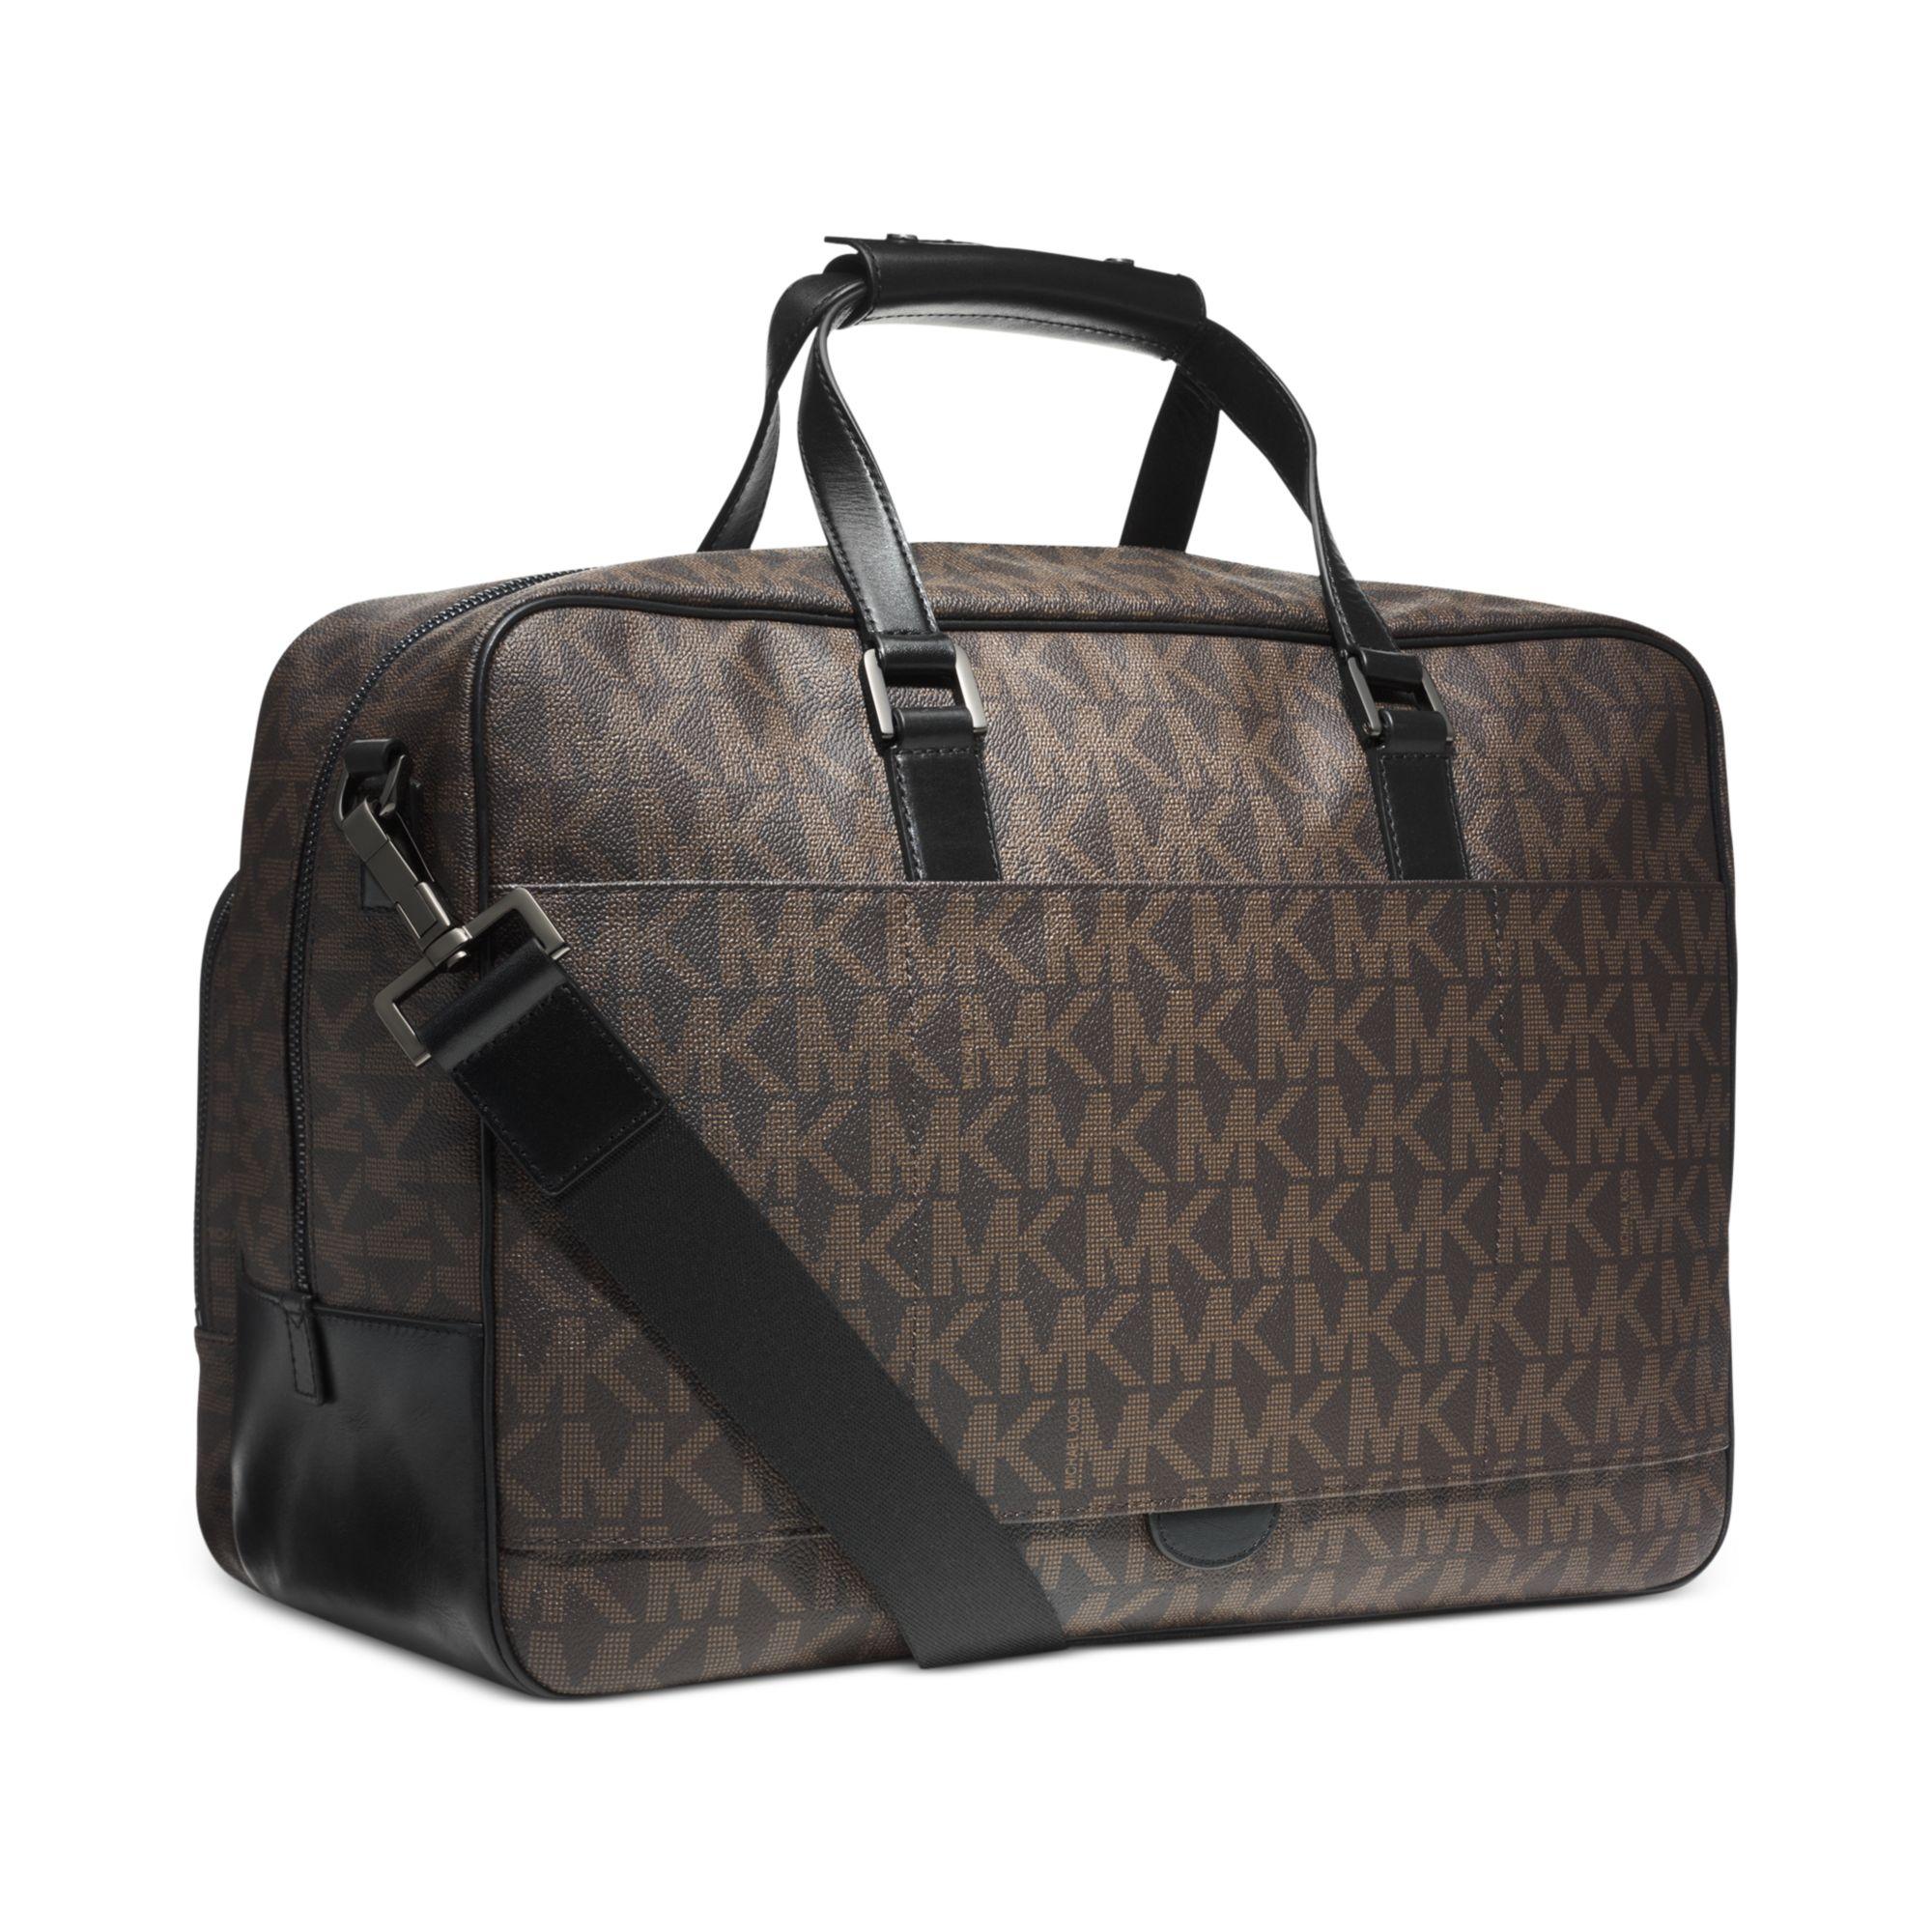 michael kors jet set travel carryon bag in brown for